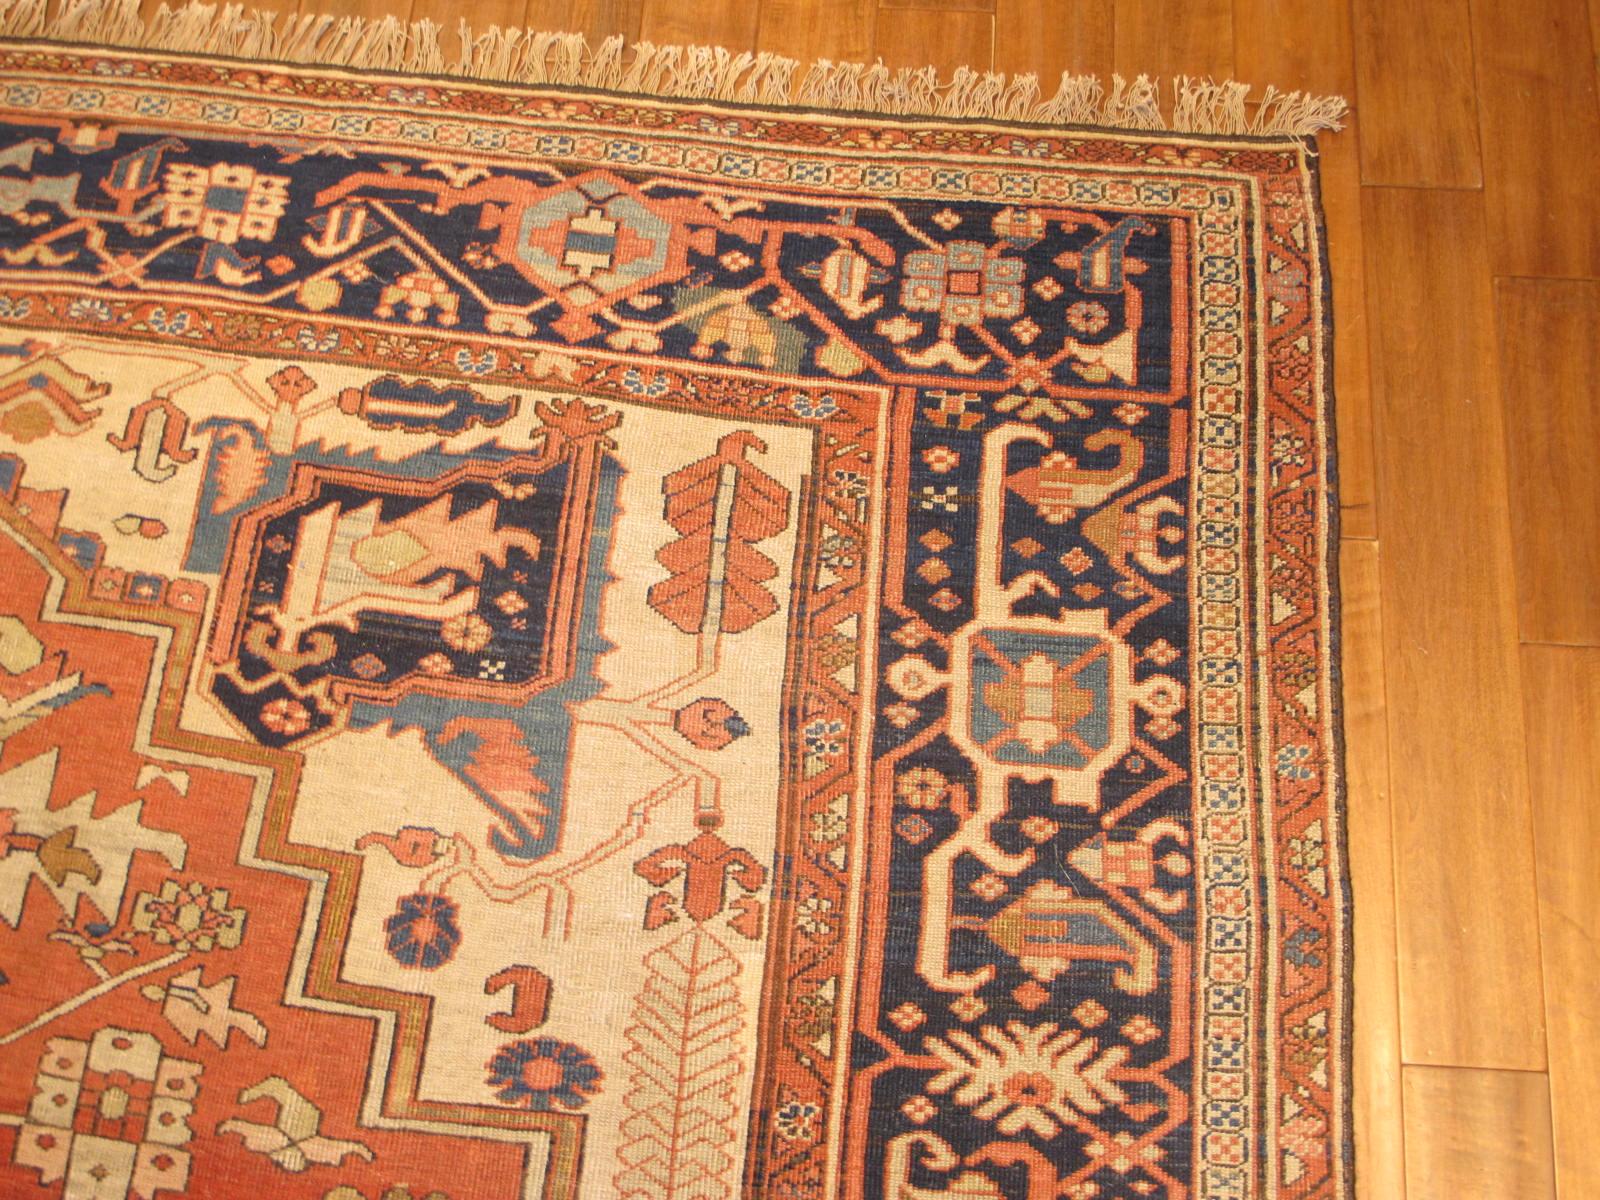 23203 antique persian serapi carpet 9,10 x 14 (2)